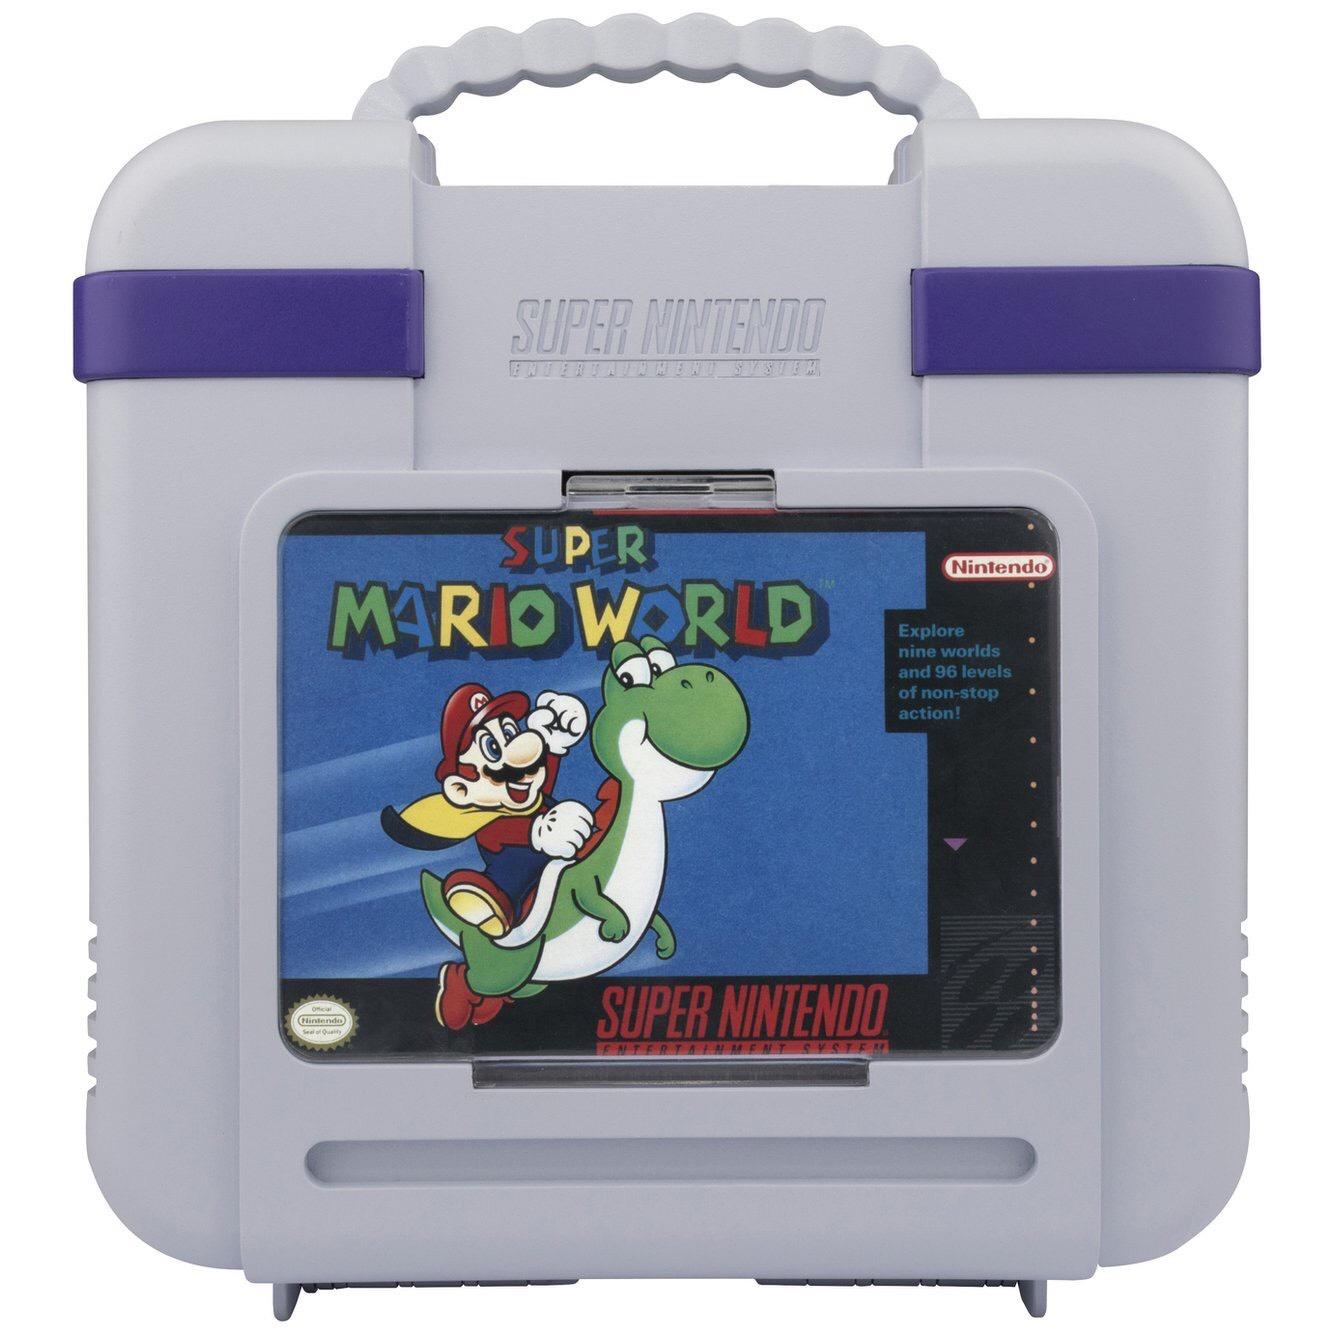 Nintendo Classic Mini: Super Nintendo (SNES) carry case. £29.99 reduced to £19.99 @ Argos